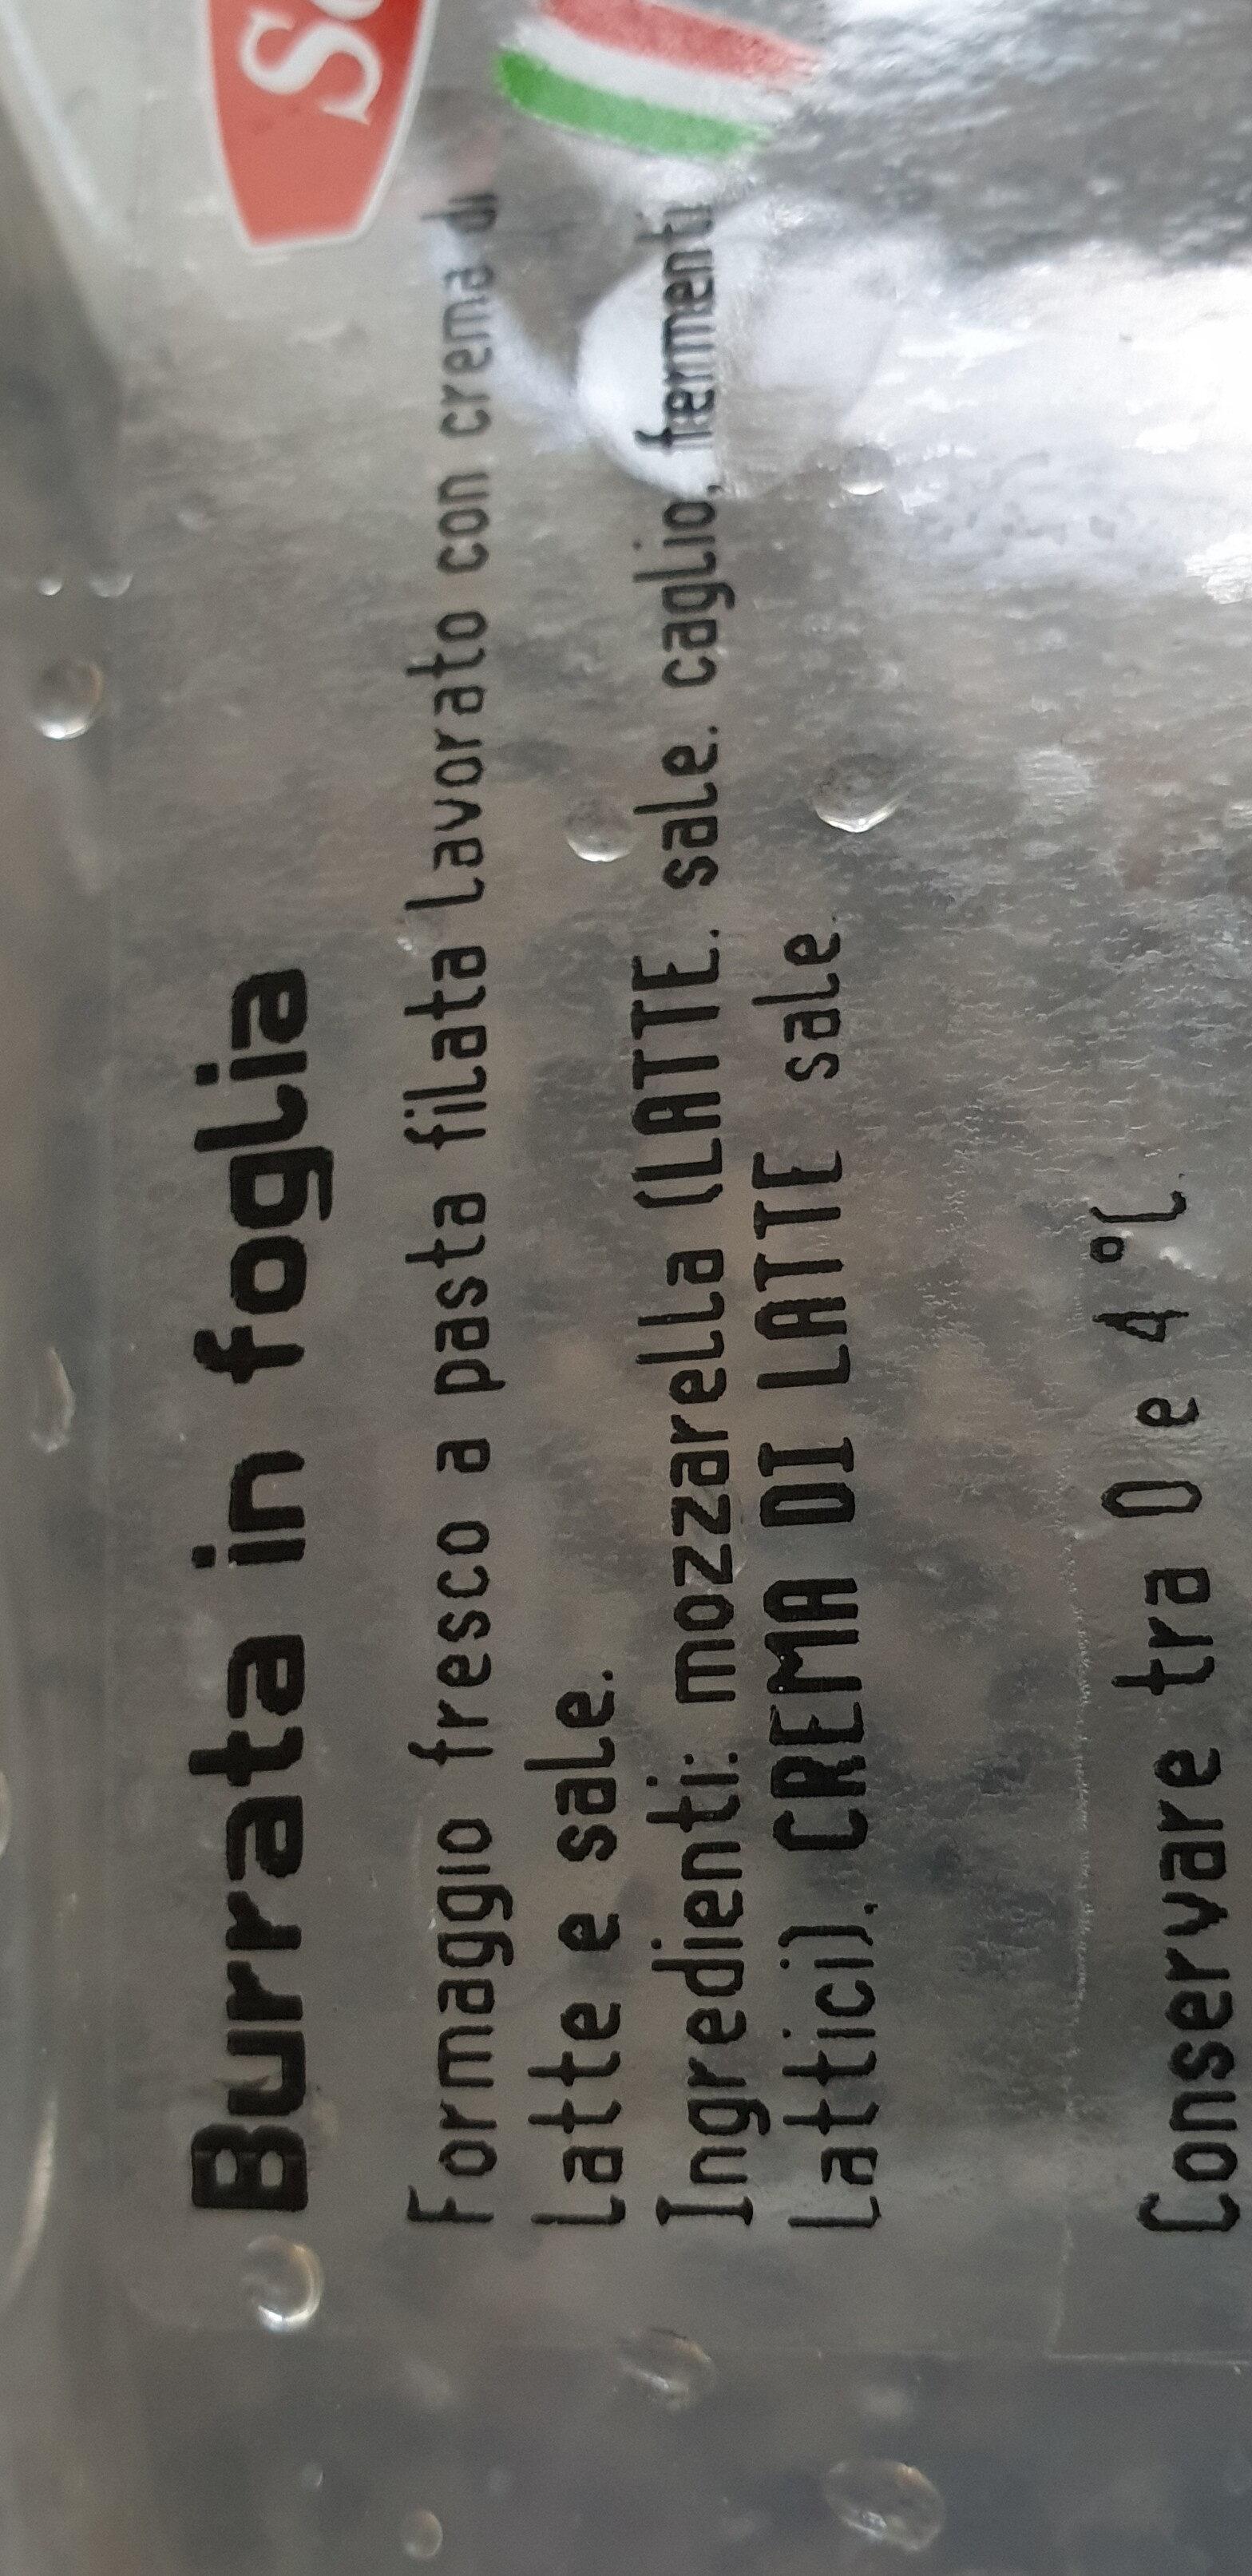 Burrata in foglia - Ingredients